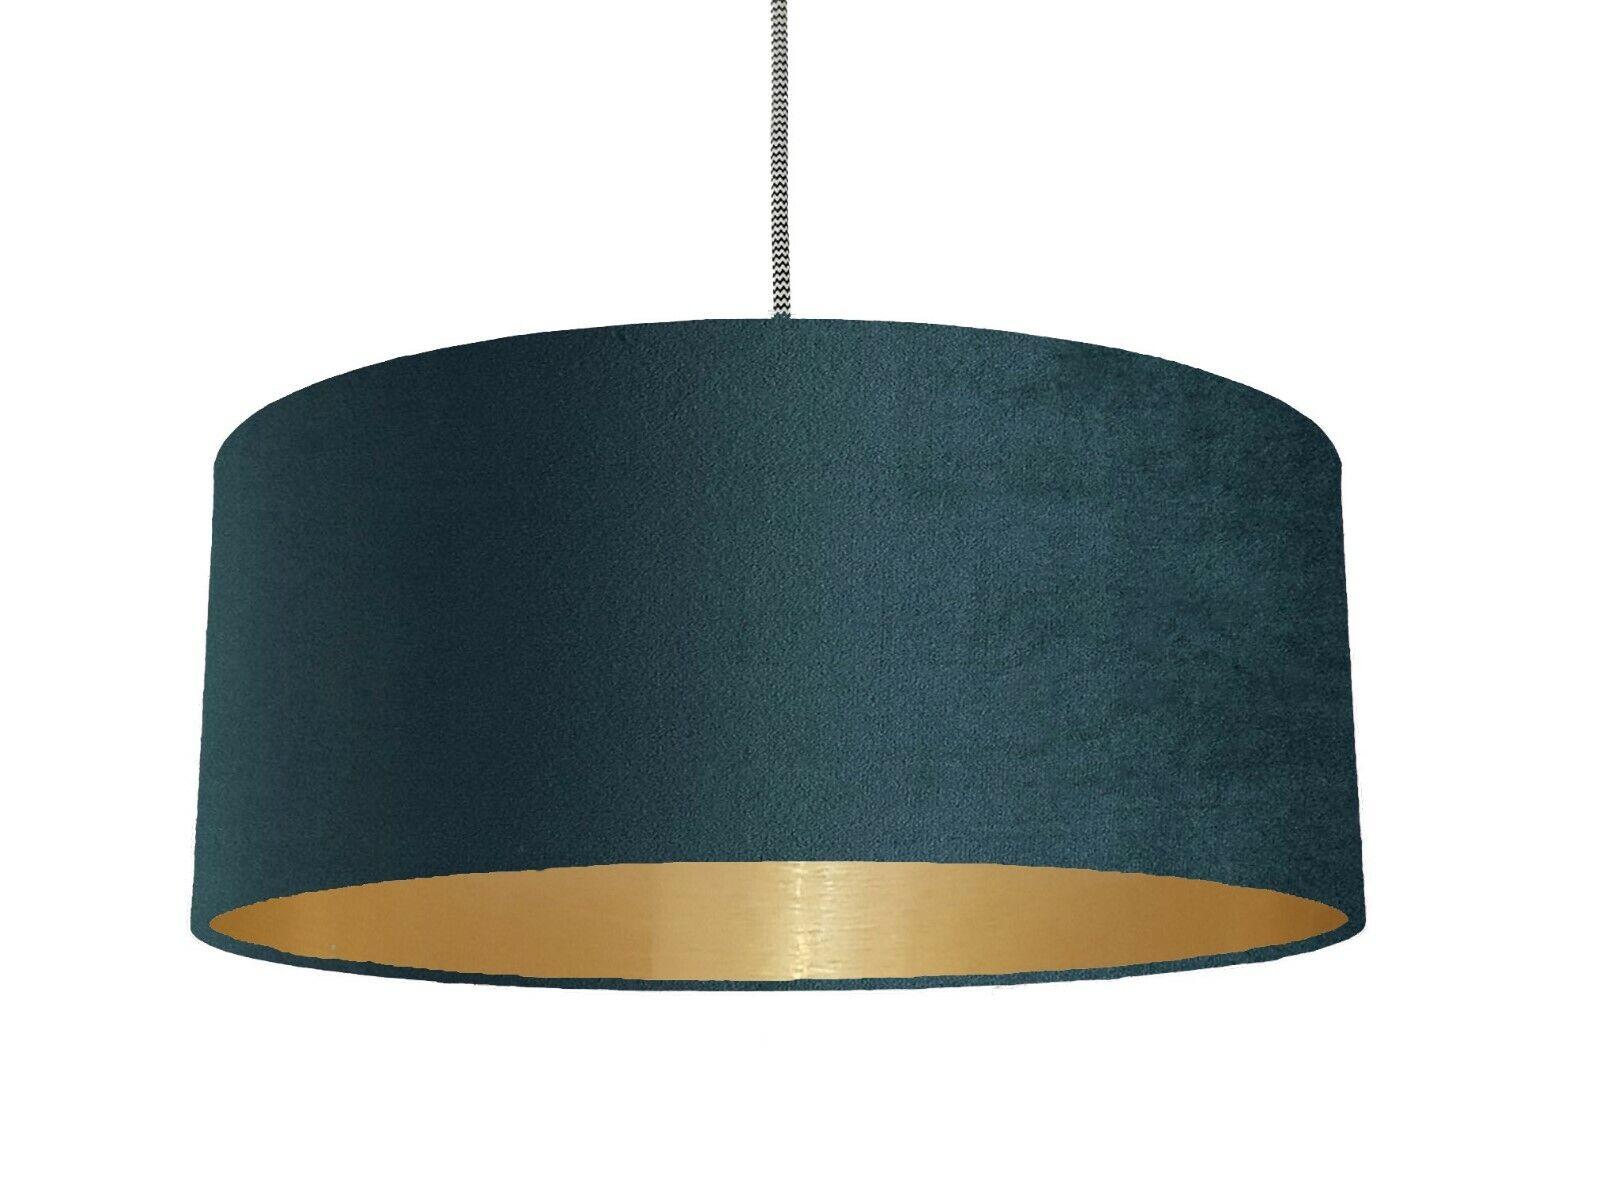 Designer Teal Blau Velvet Lampshade Brushed Metallic Champagne Gold 7 linings